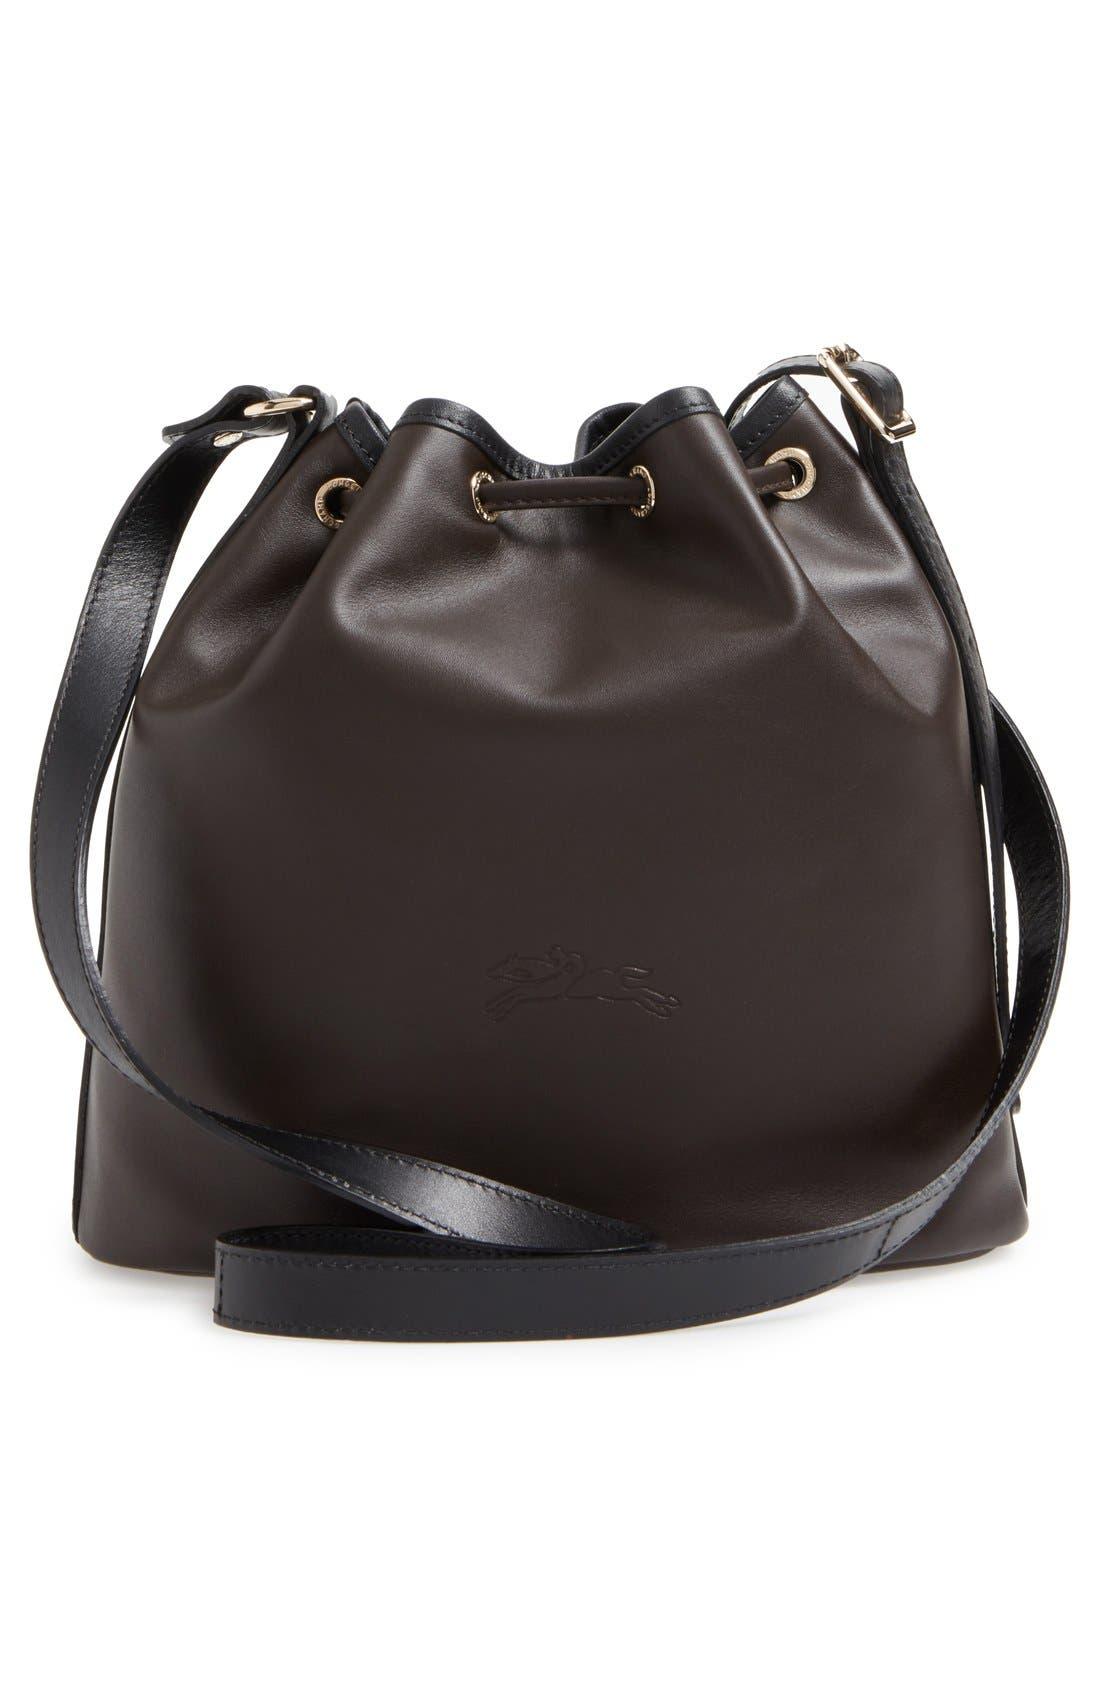 Alternate Image 3  - Longchamp 'Small 2.0' Leather Bucket Bag